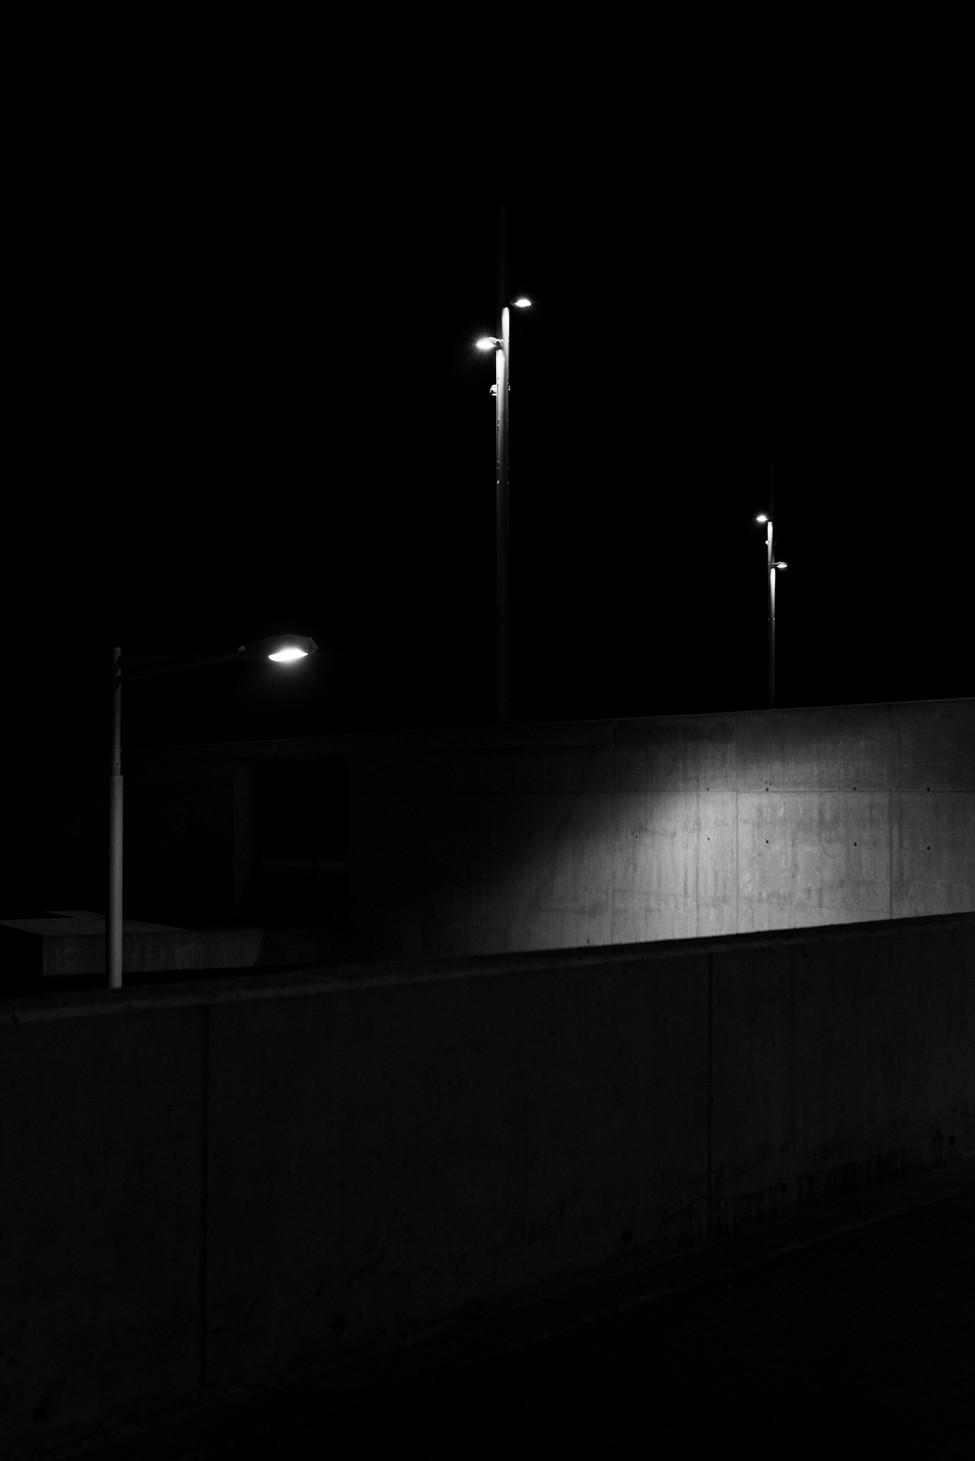 7DSC_4794-1.jpg